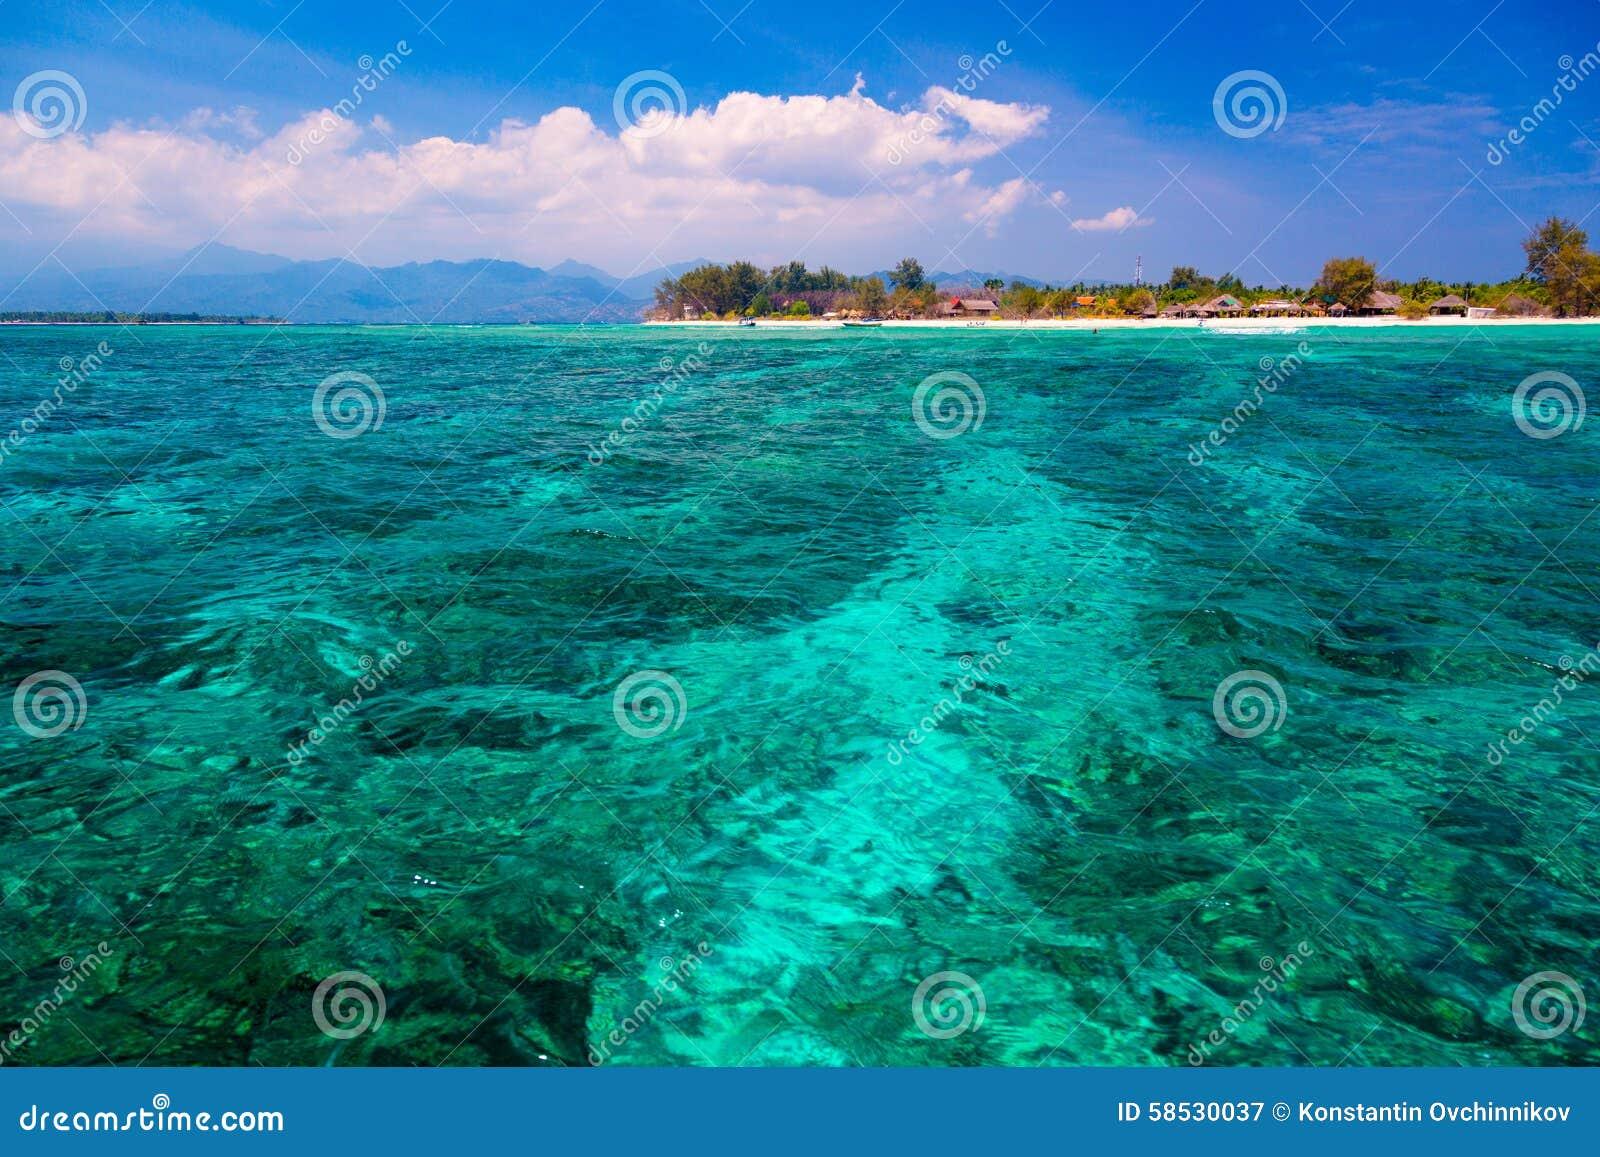 Lagoon Tropical Island: Tropical Lagoon Stock Photo